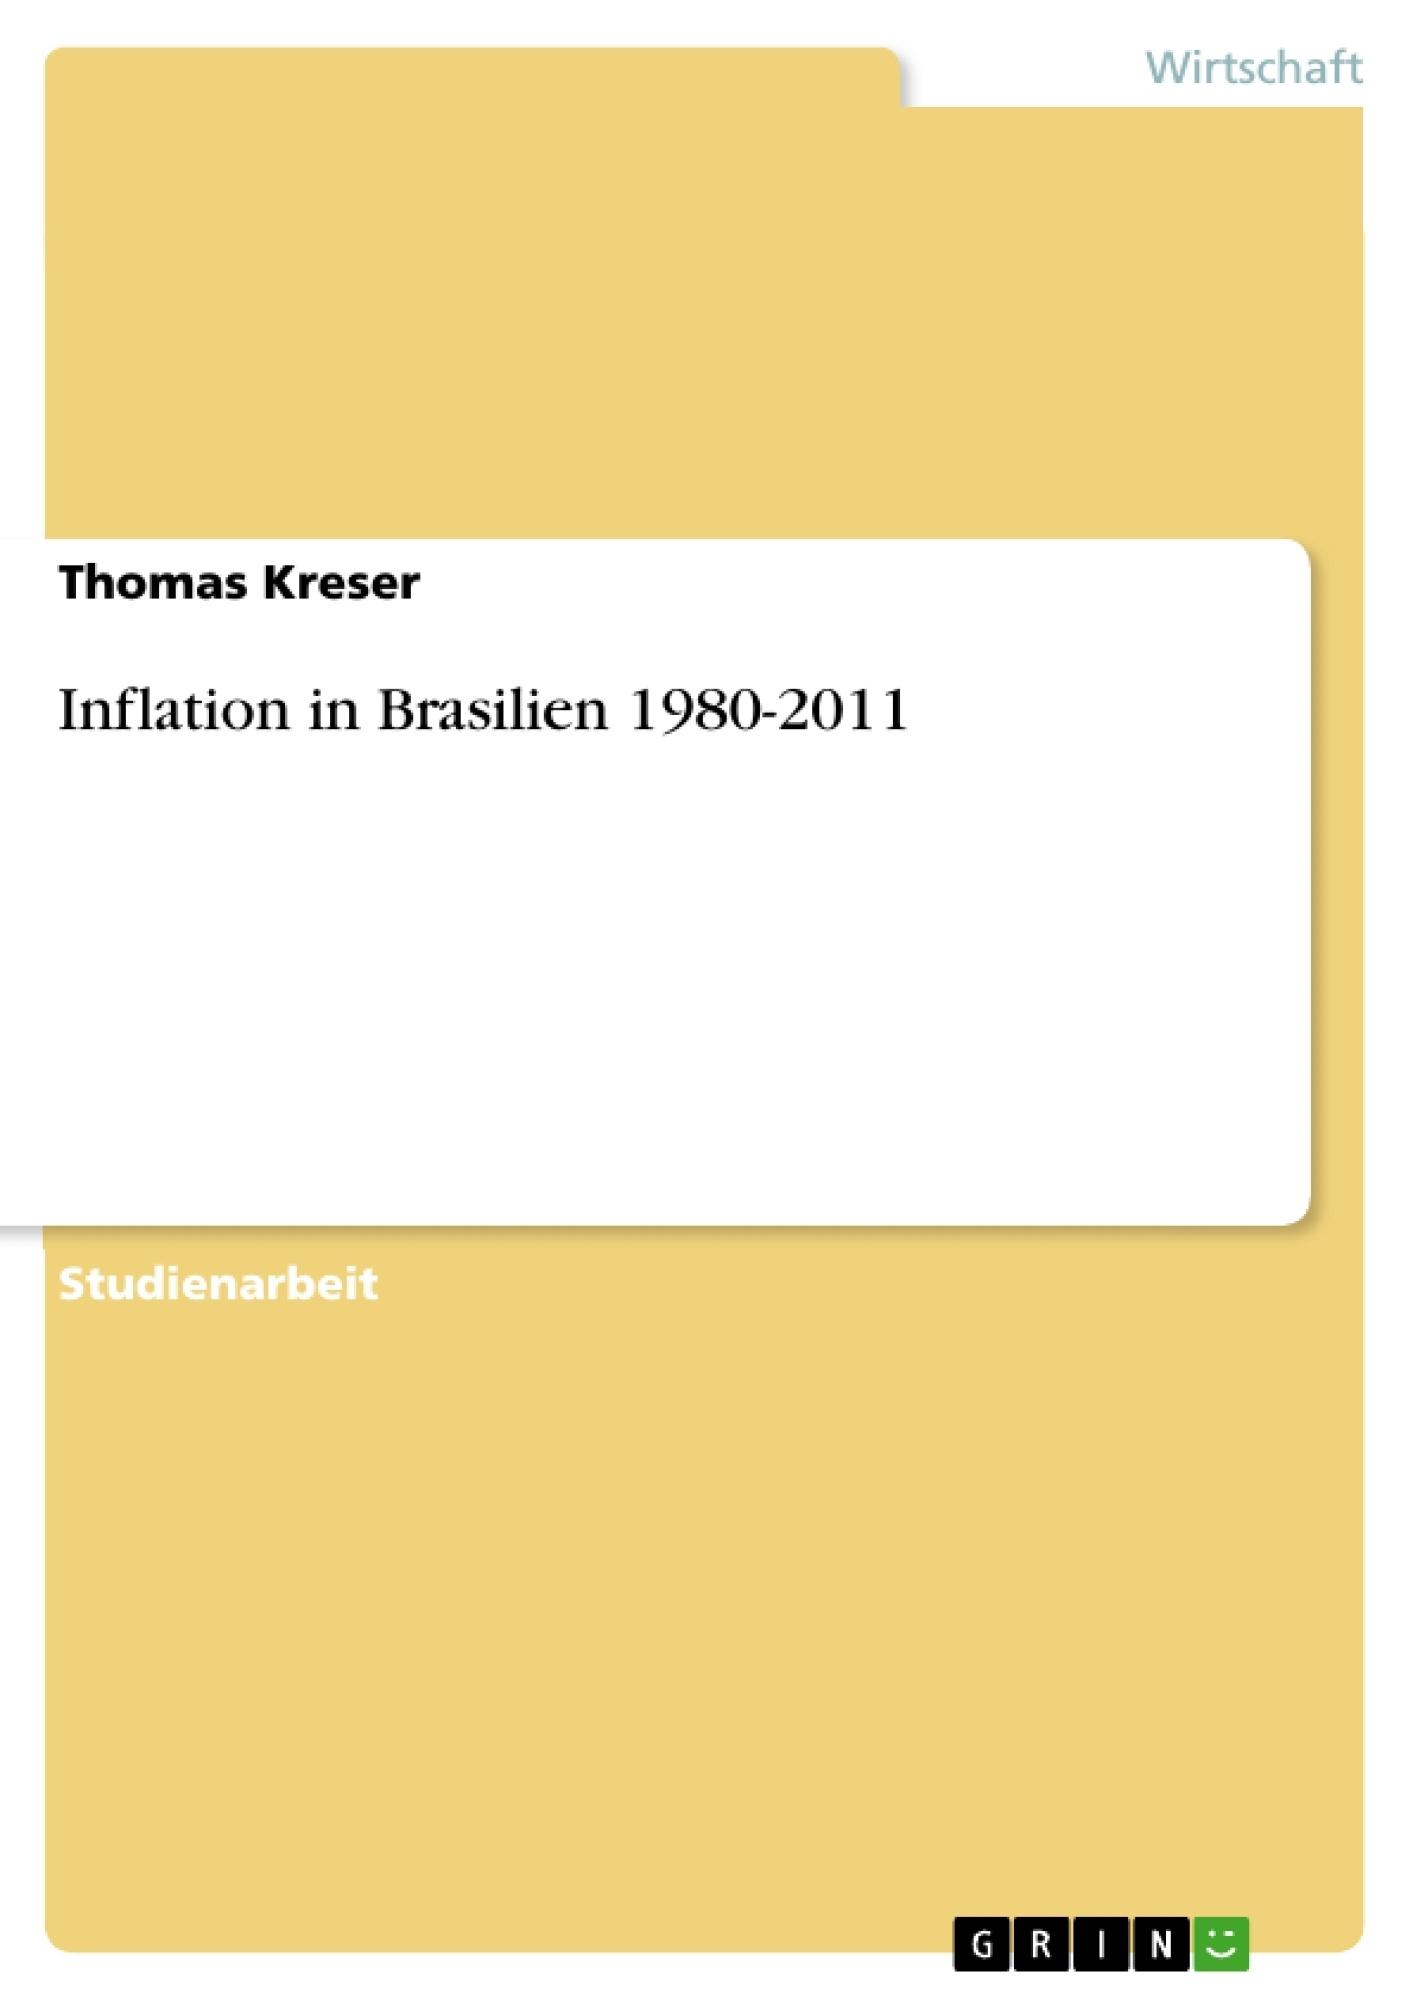 Titel: Inflation in Brasilien 1980-2011